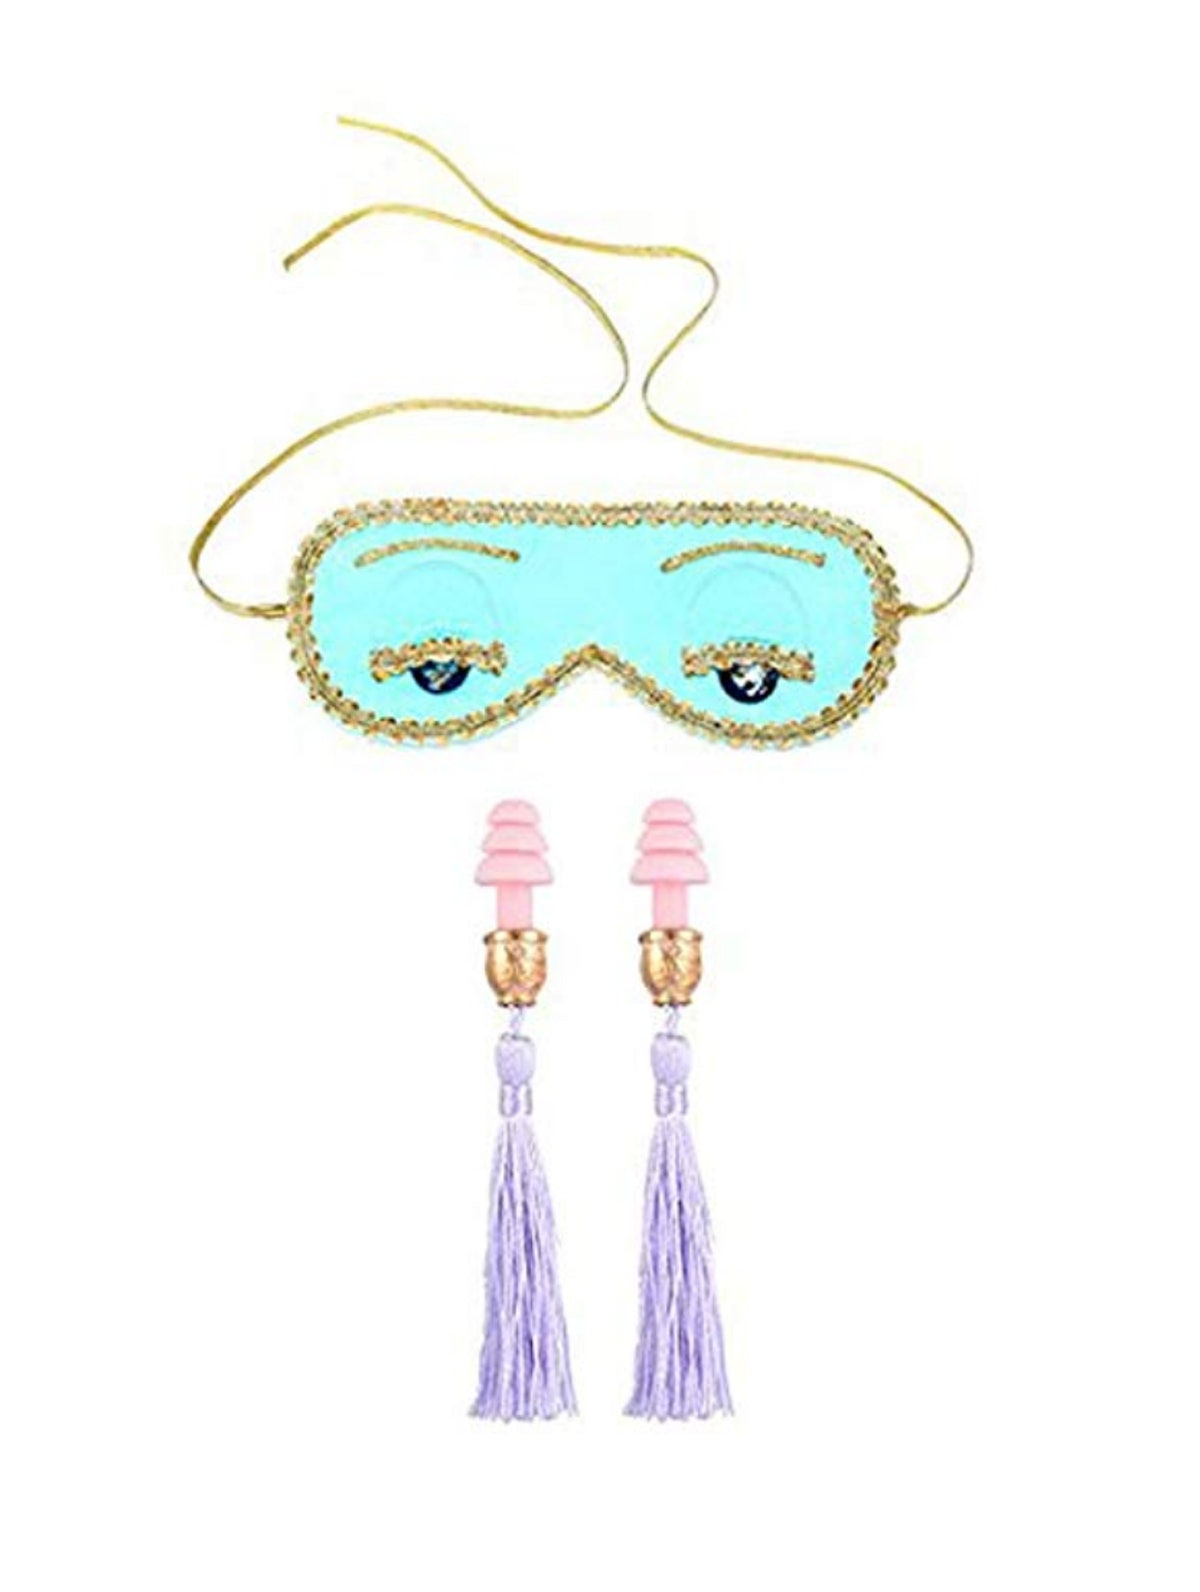 Utopiat's Breakfast at Tiffany's Sleep Mask and Earplugs Set